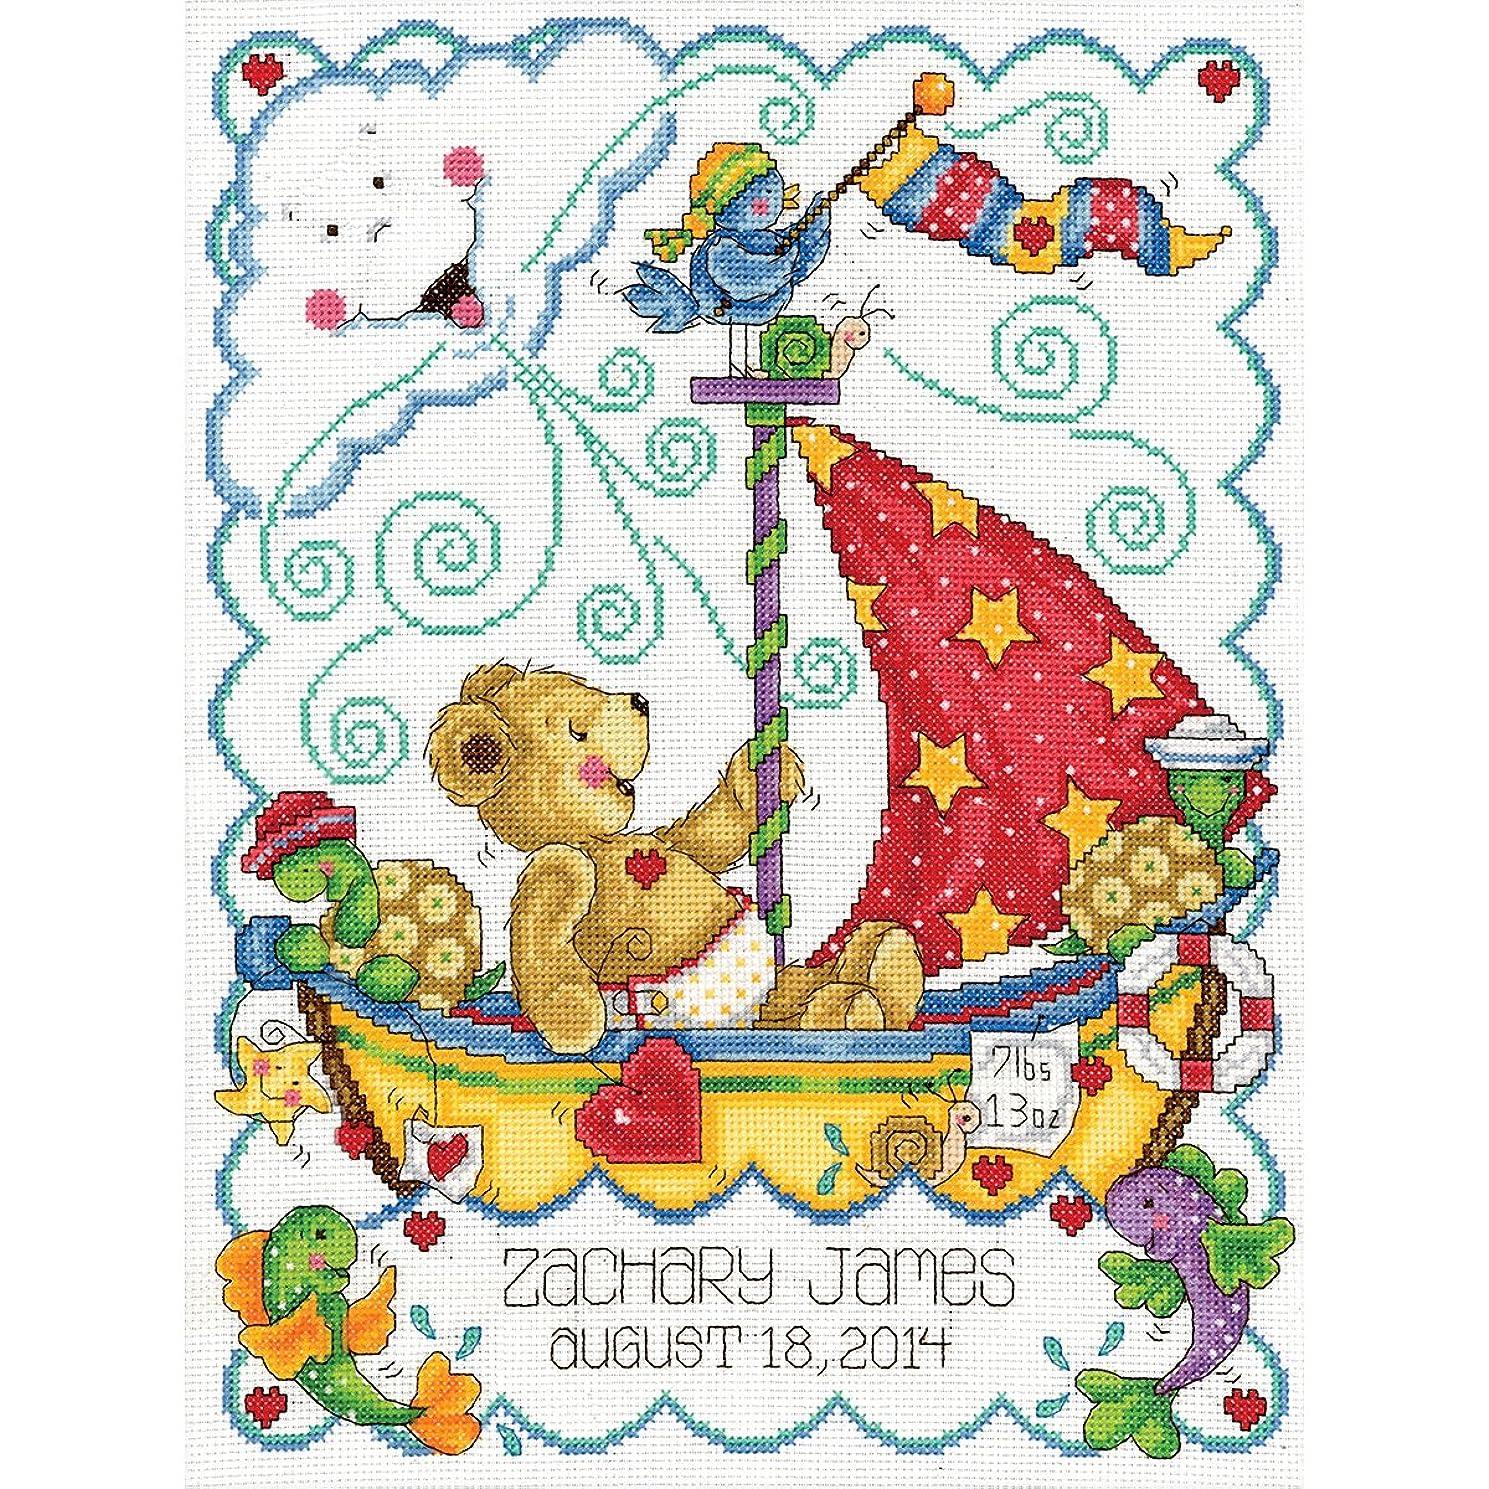 Tobin Sail Away Baby Counted Cross Stitch Kit, 11-Inch x 14-Inch